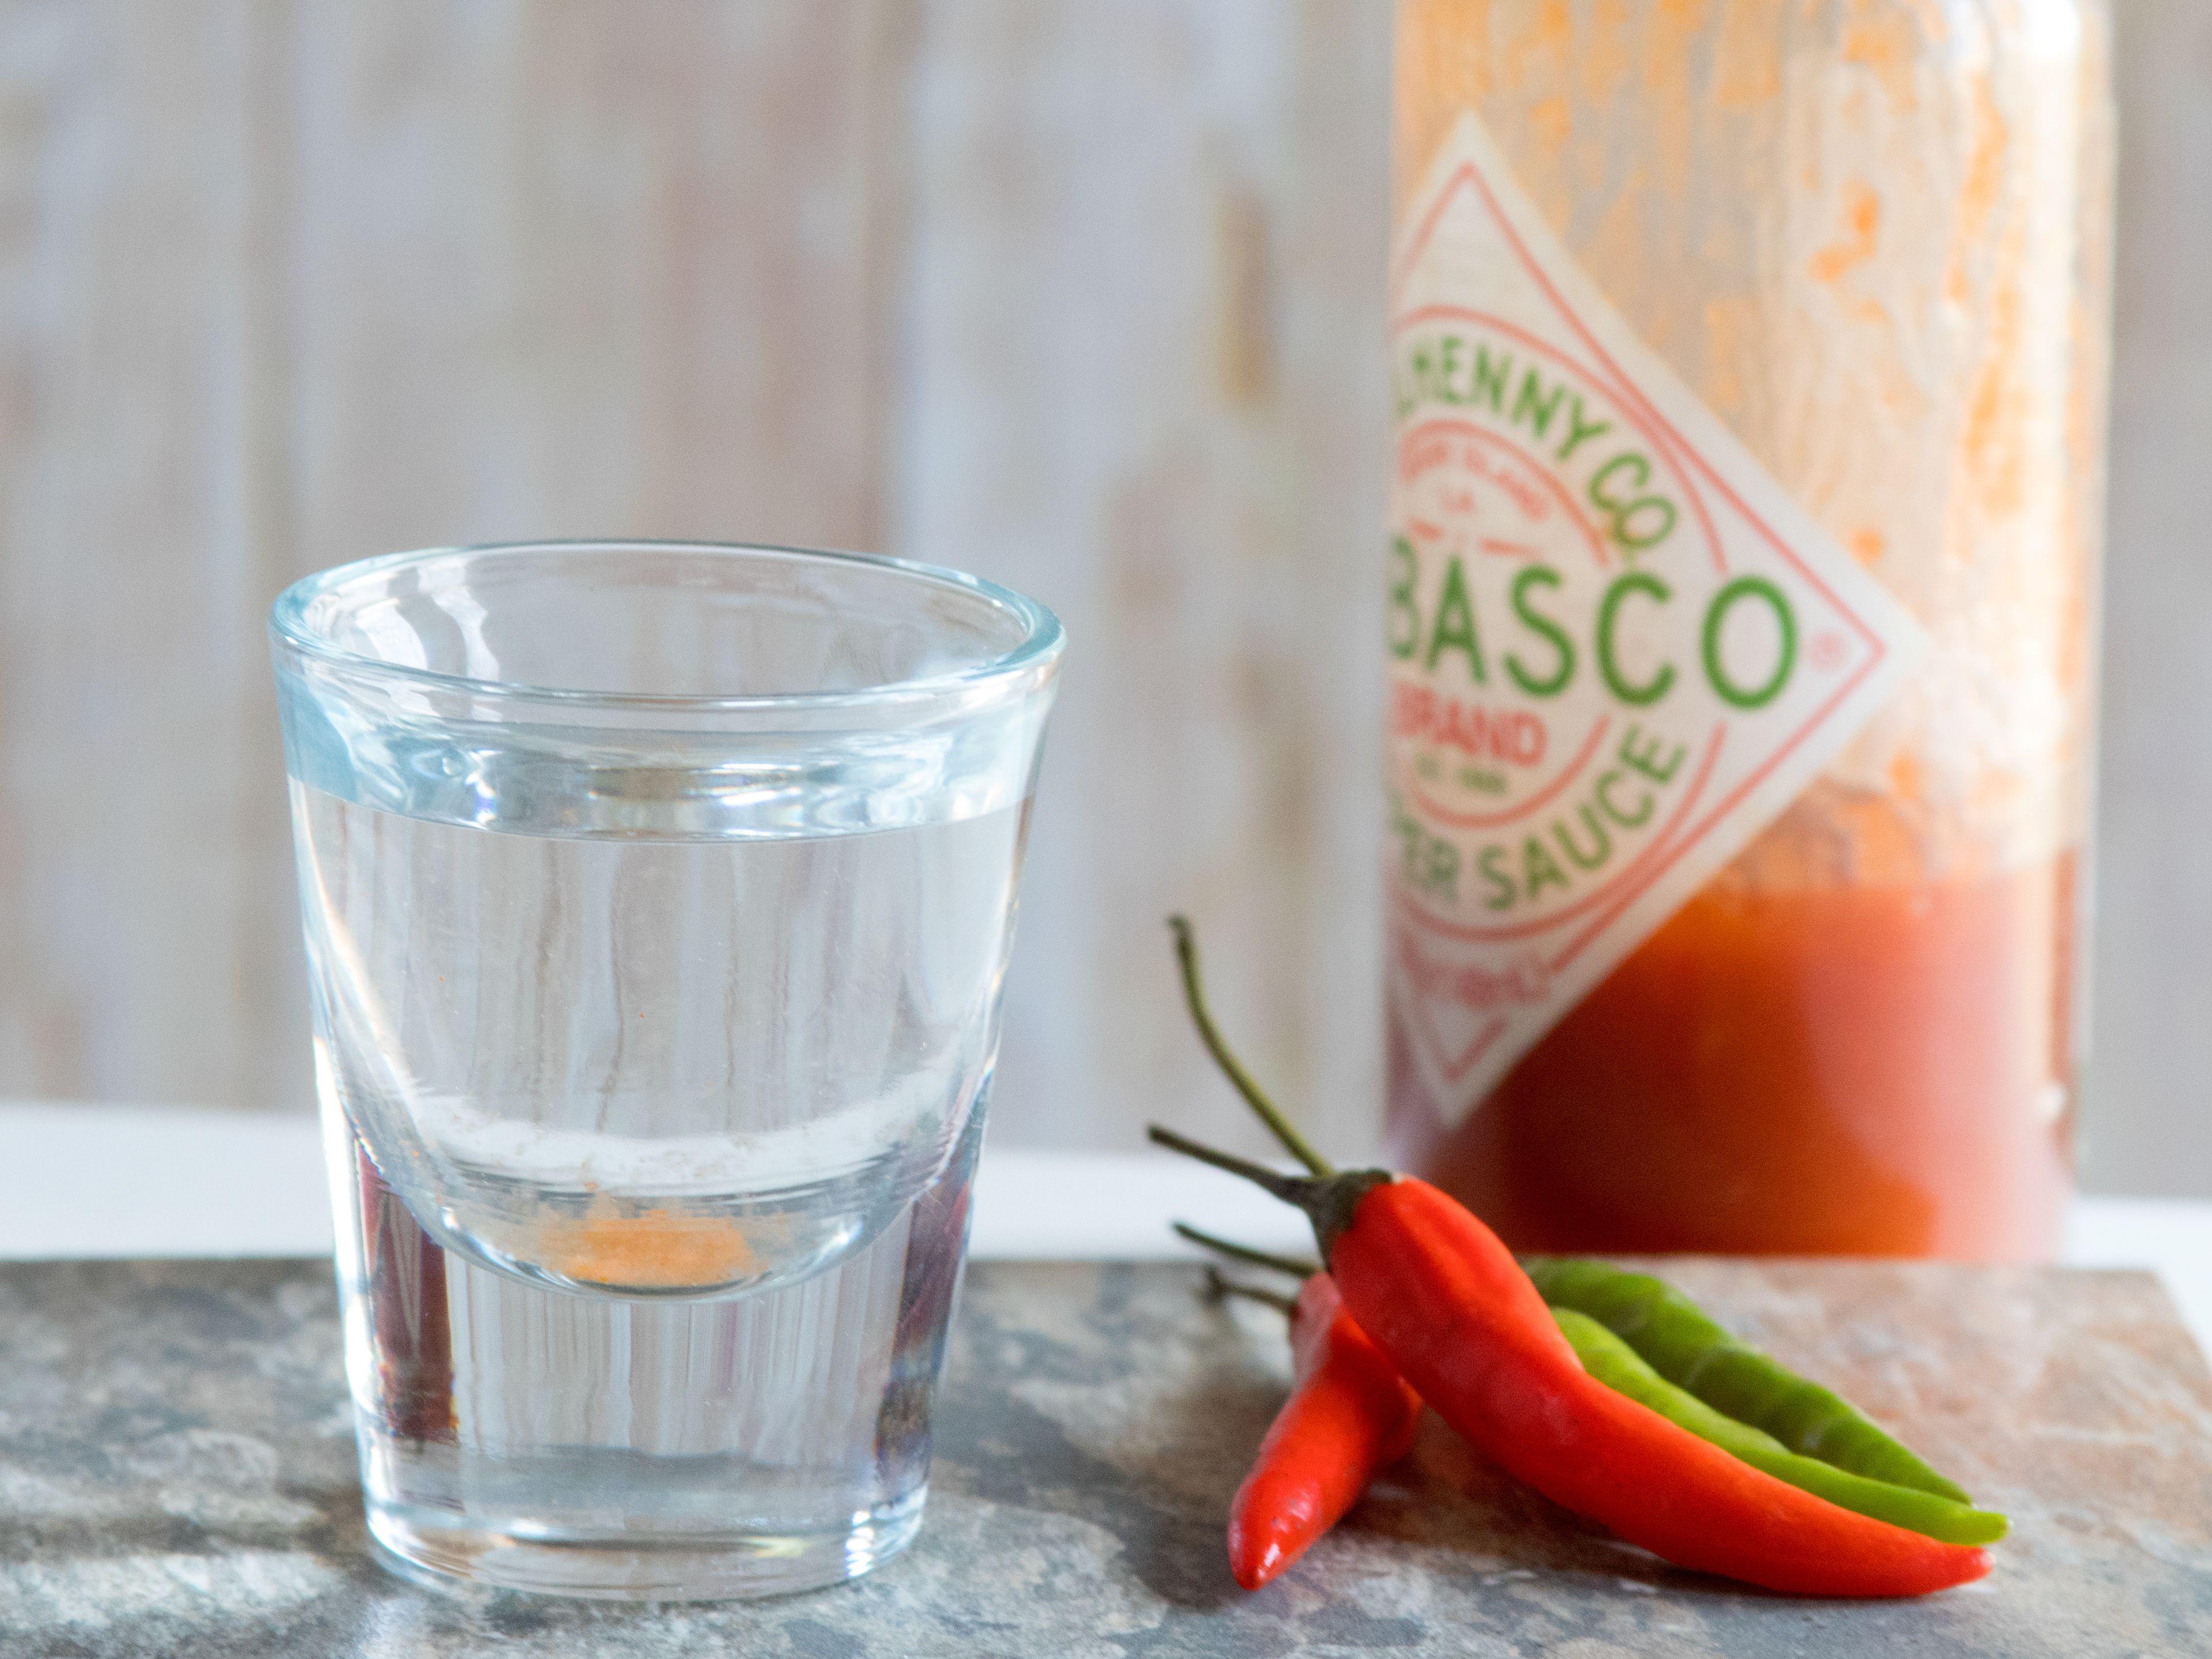 Prairie Fire Recipe A Hot Shot Of Tequila And Tabasco